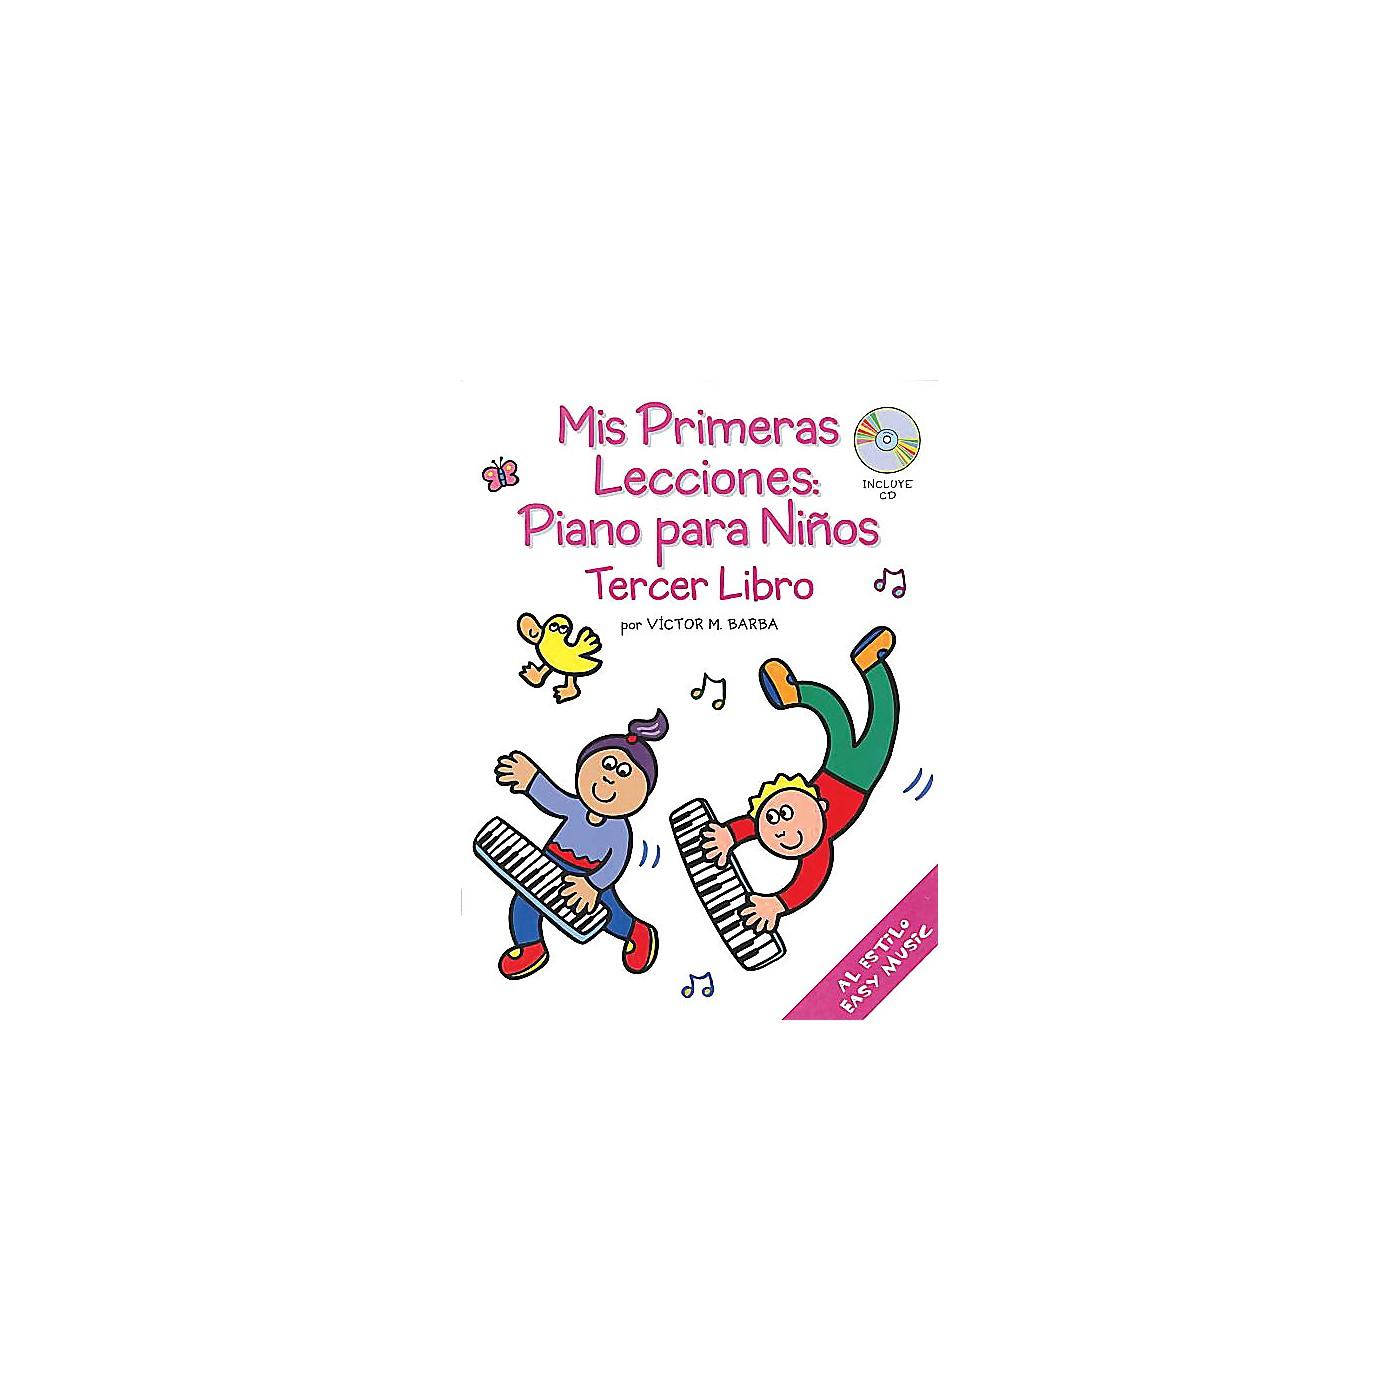 Music Sales Mis Primeras Lecciones: Piano Para Ni±os (Tercer Libro) Music Sales America BK/CD by Victor Barba thumbnail